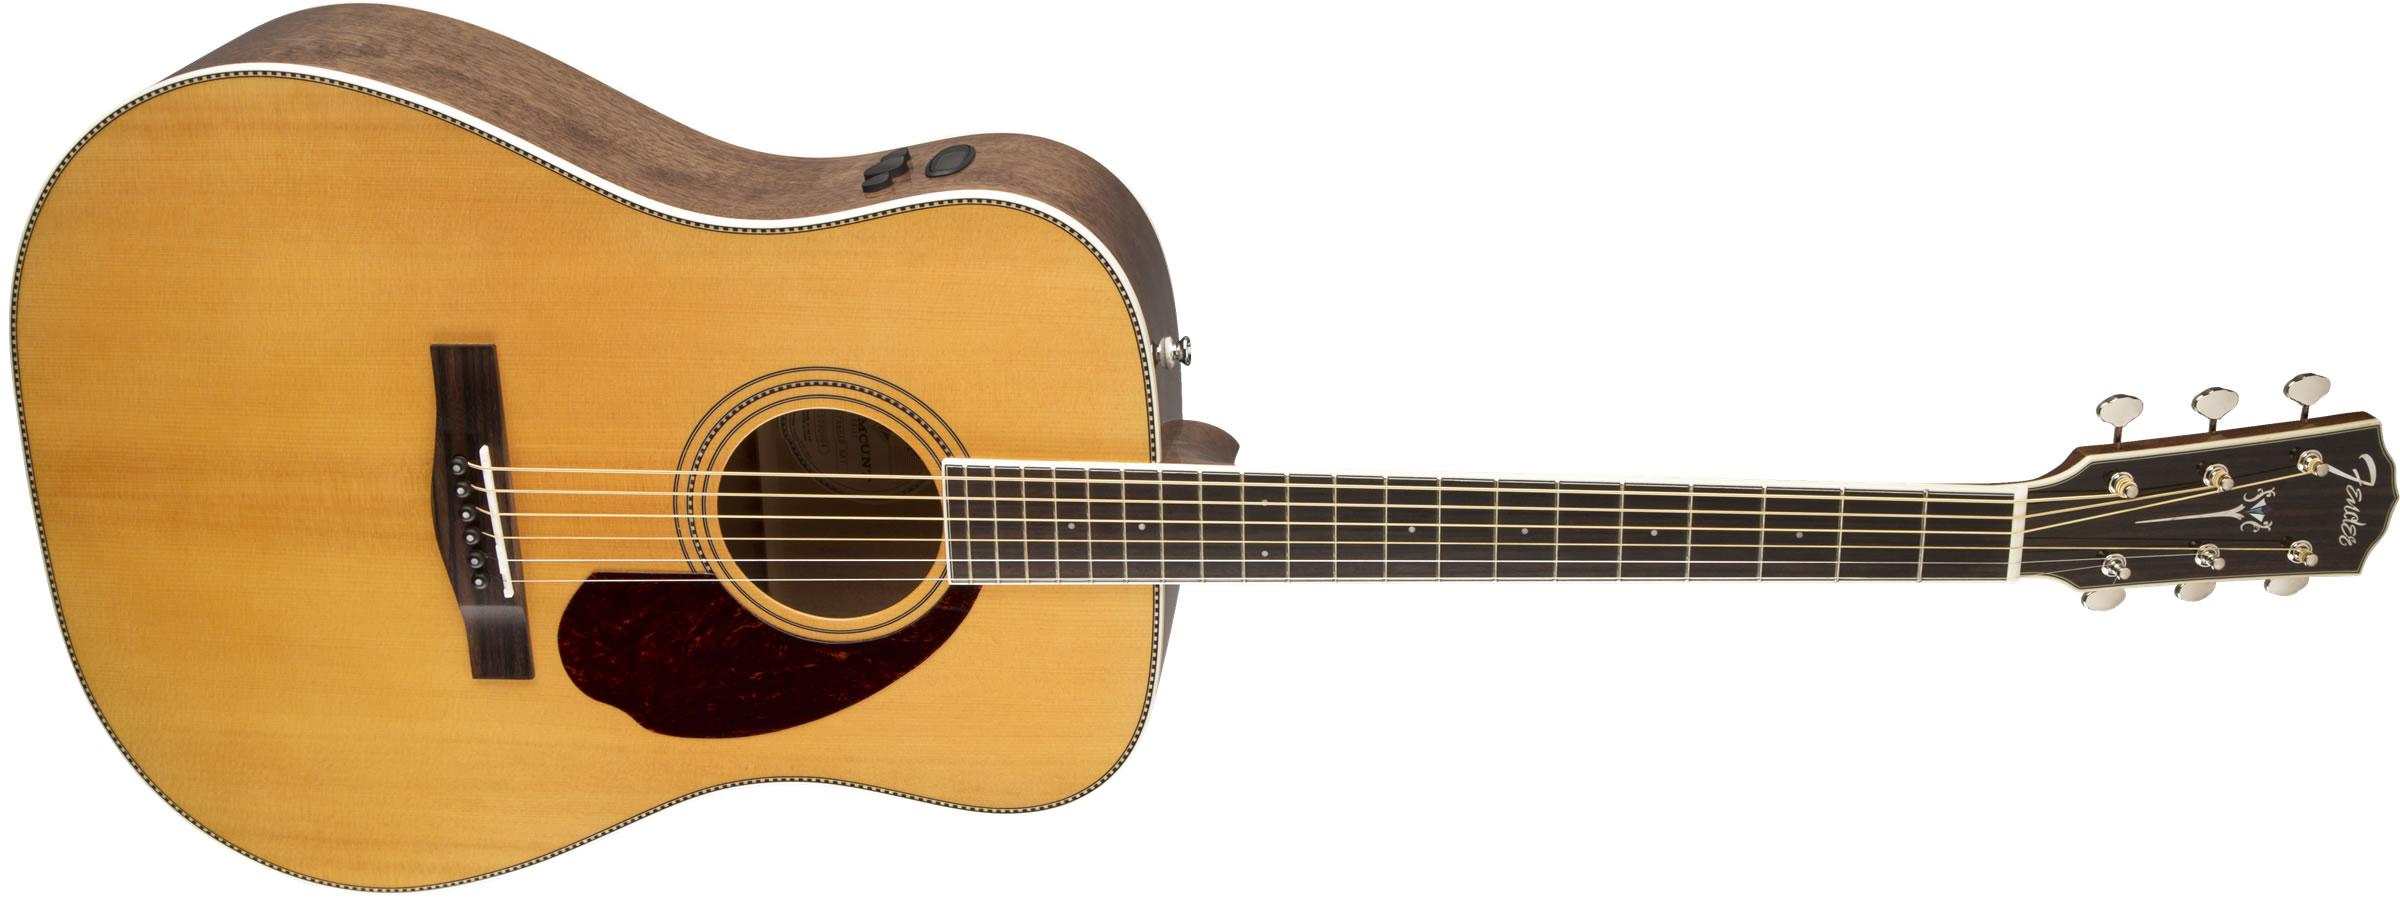 fender paramount series pm 1 standard natural elektro akustik gitar. Black Bedroom Furniture Sets. Home Design Ideas